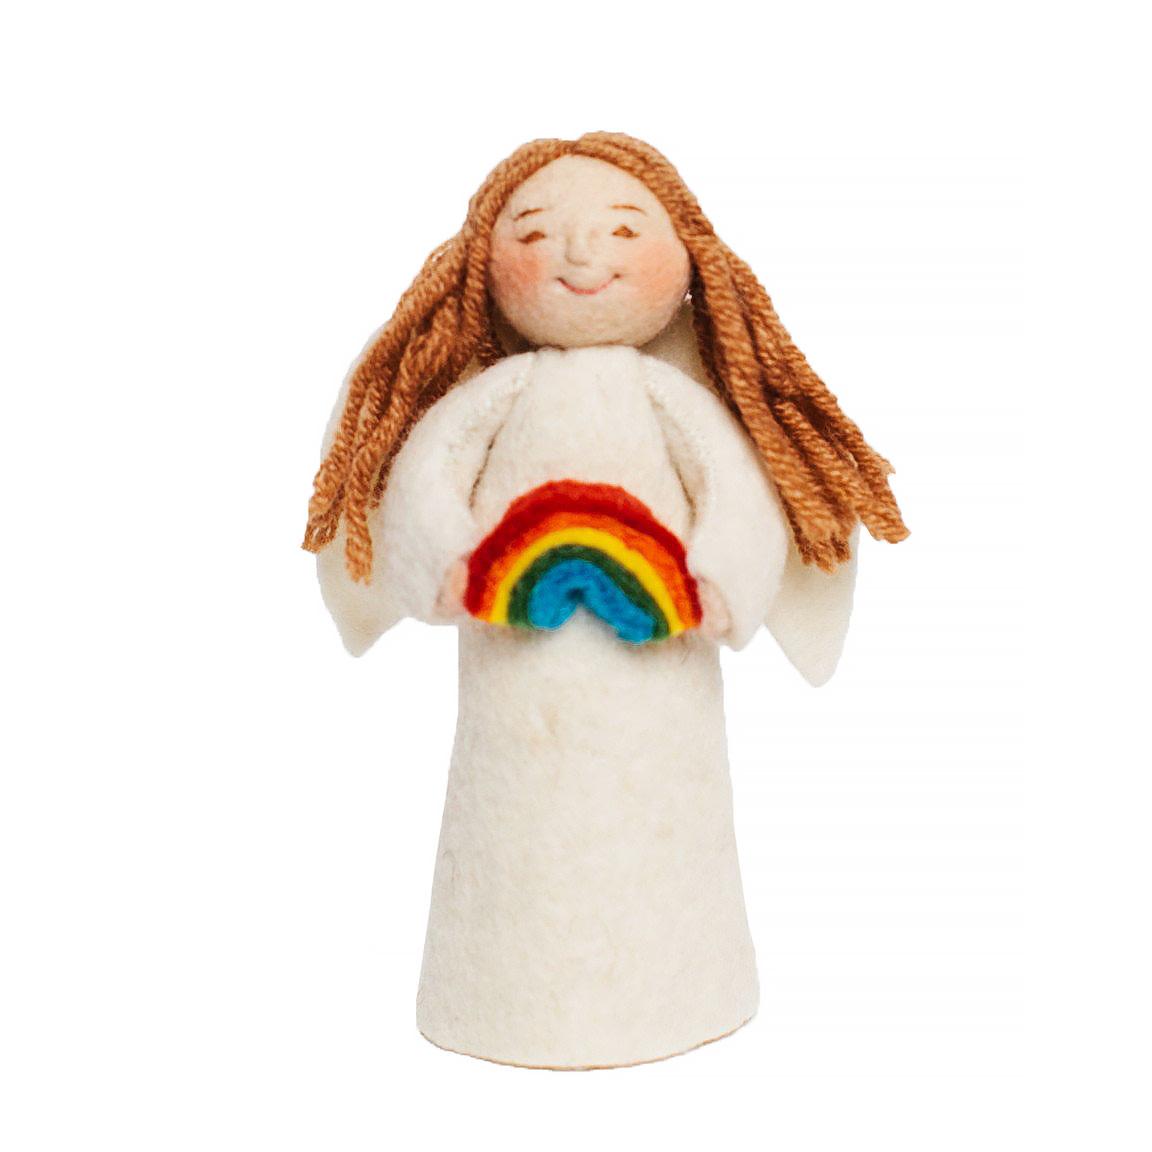 Craftspring Rainbow Gift Angel